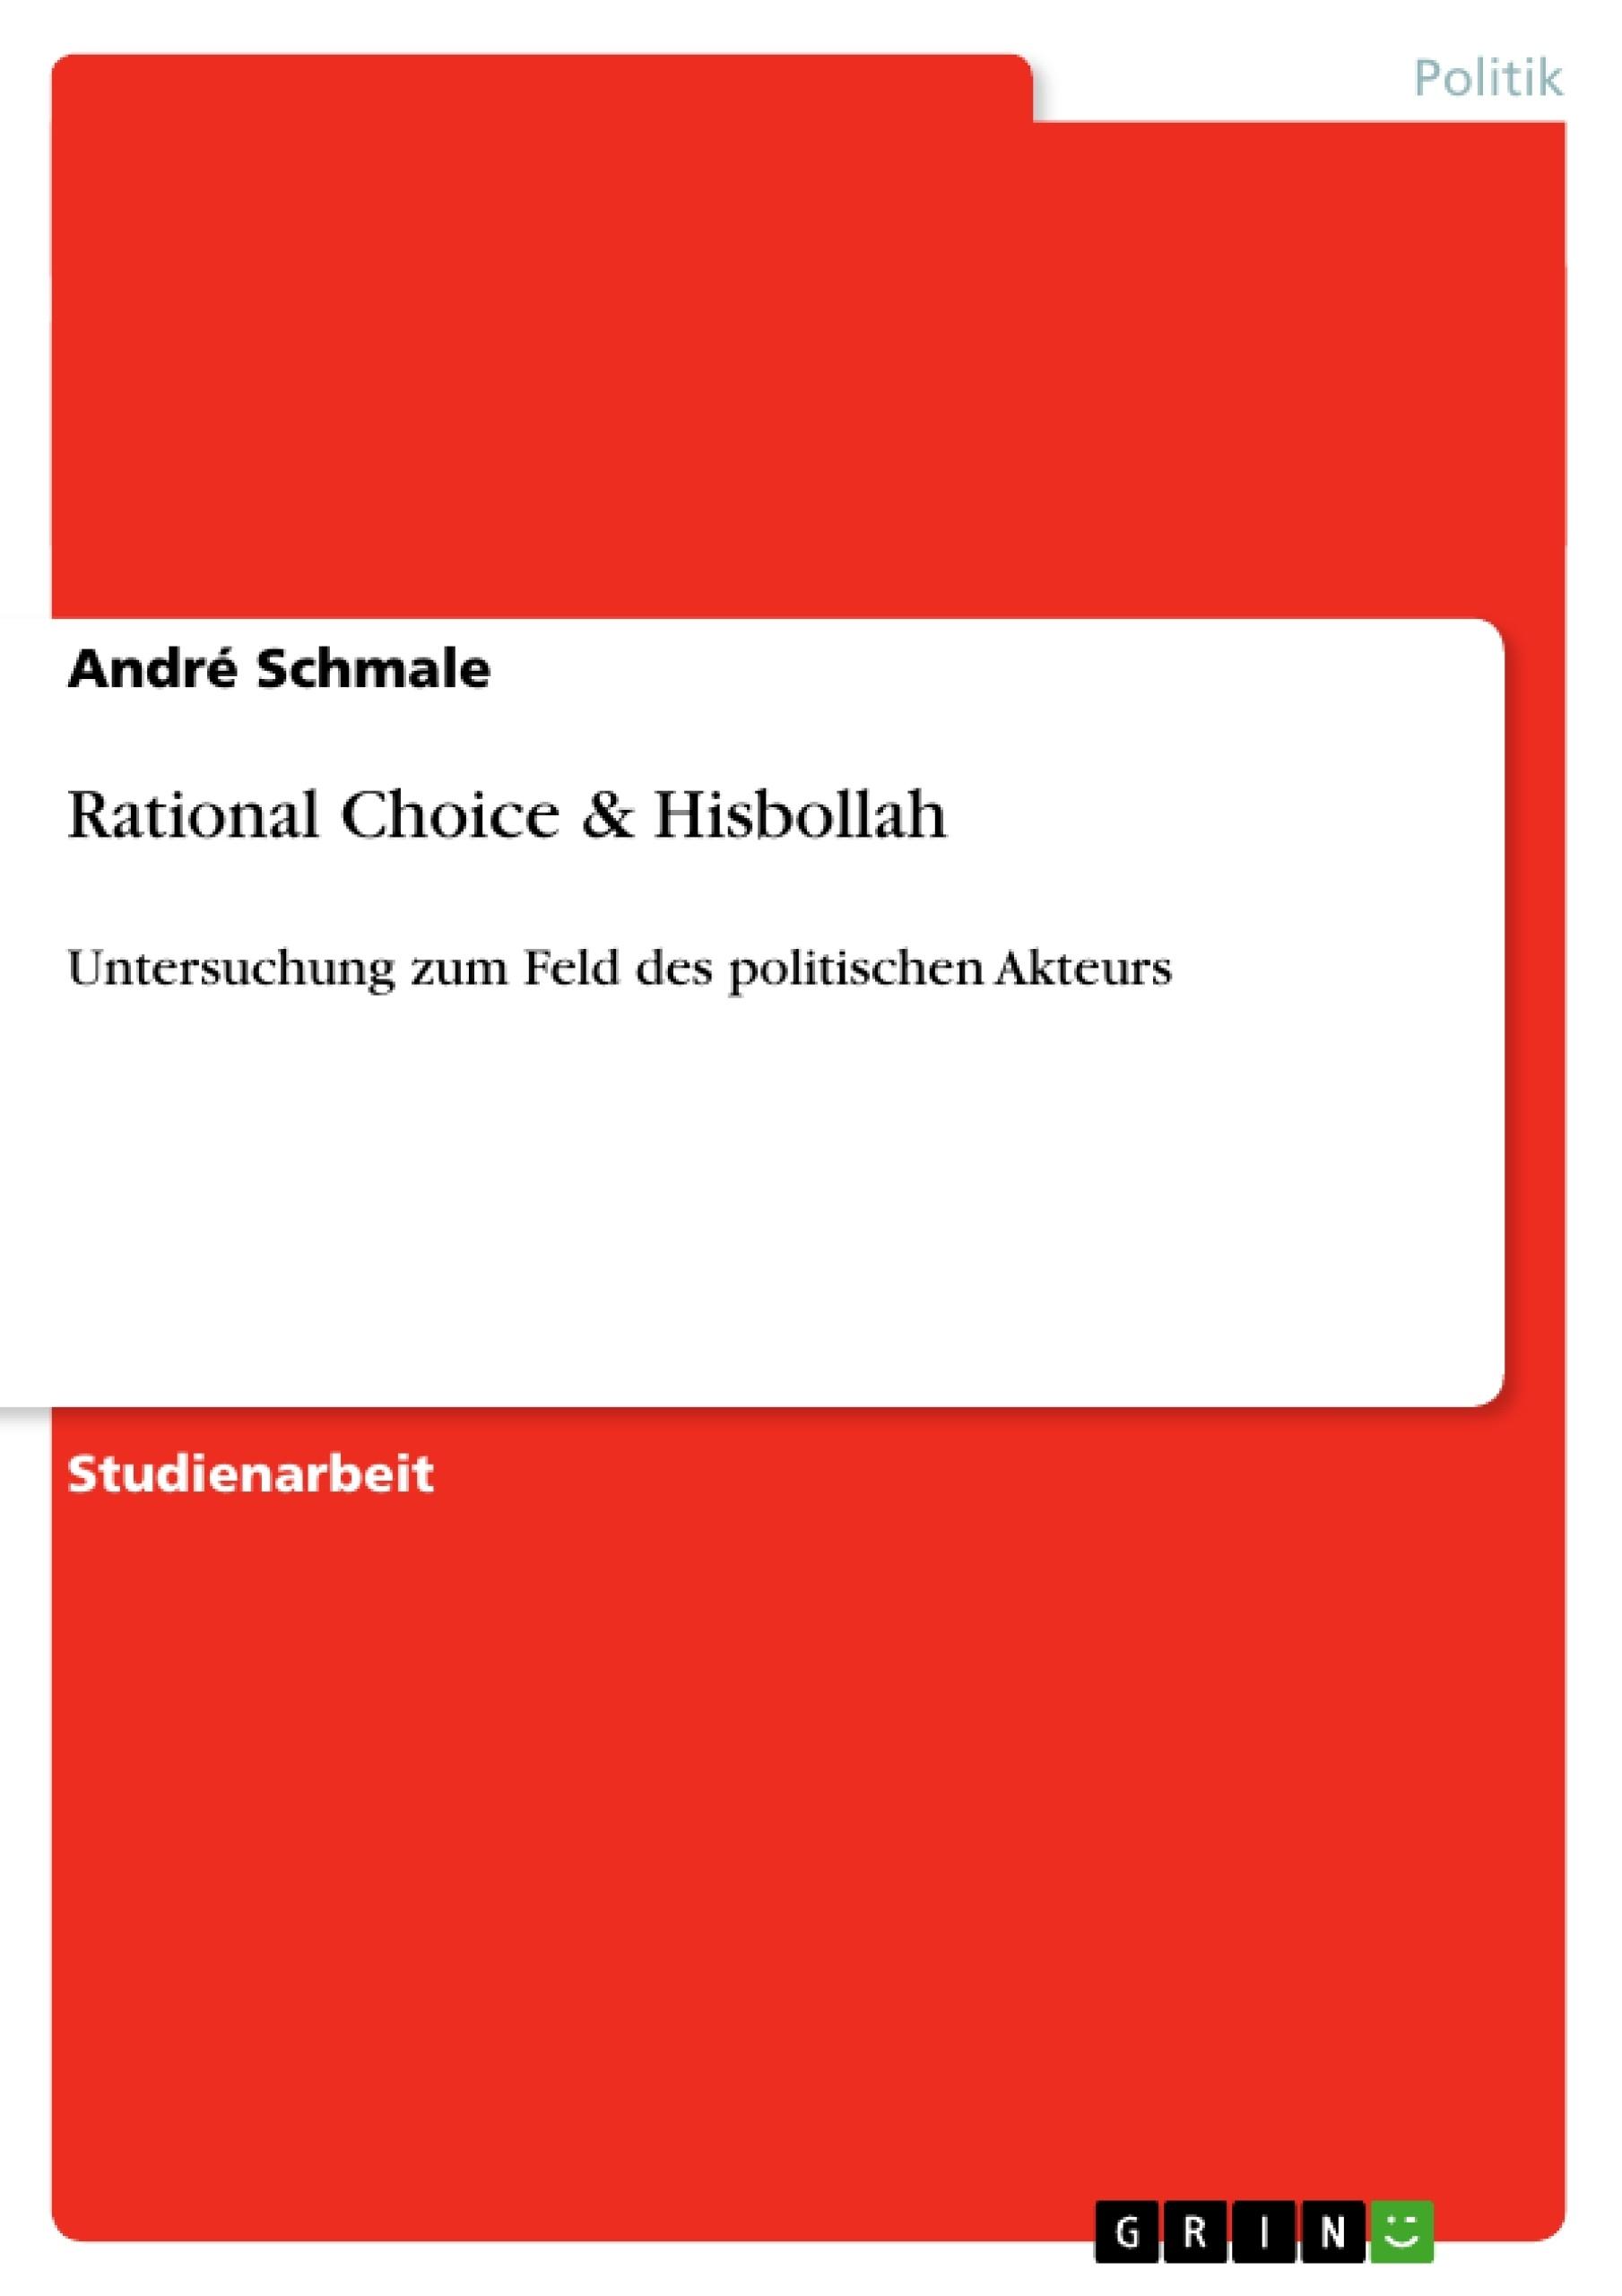 Titel: Rational Choice & Hisbollah